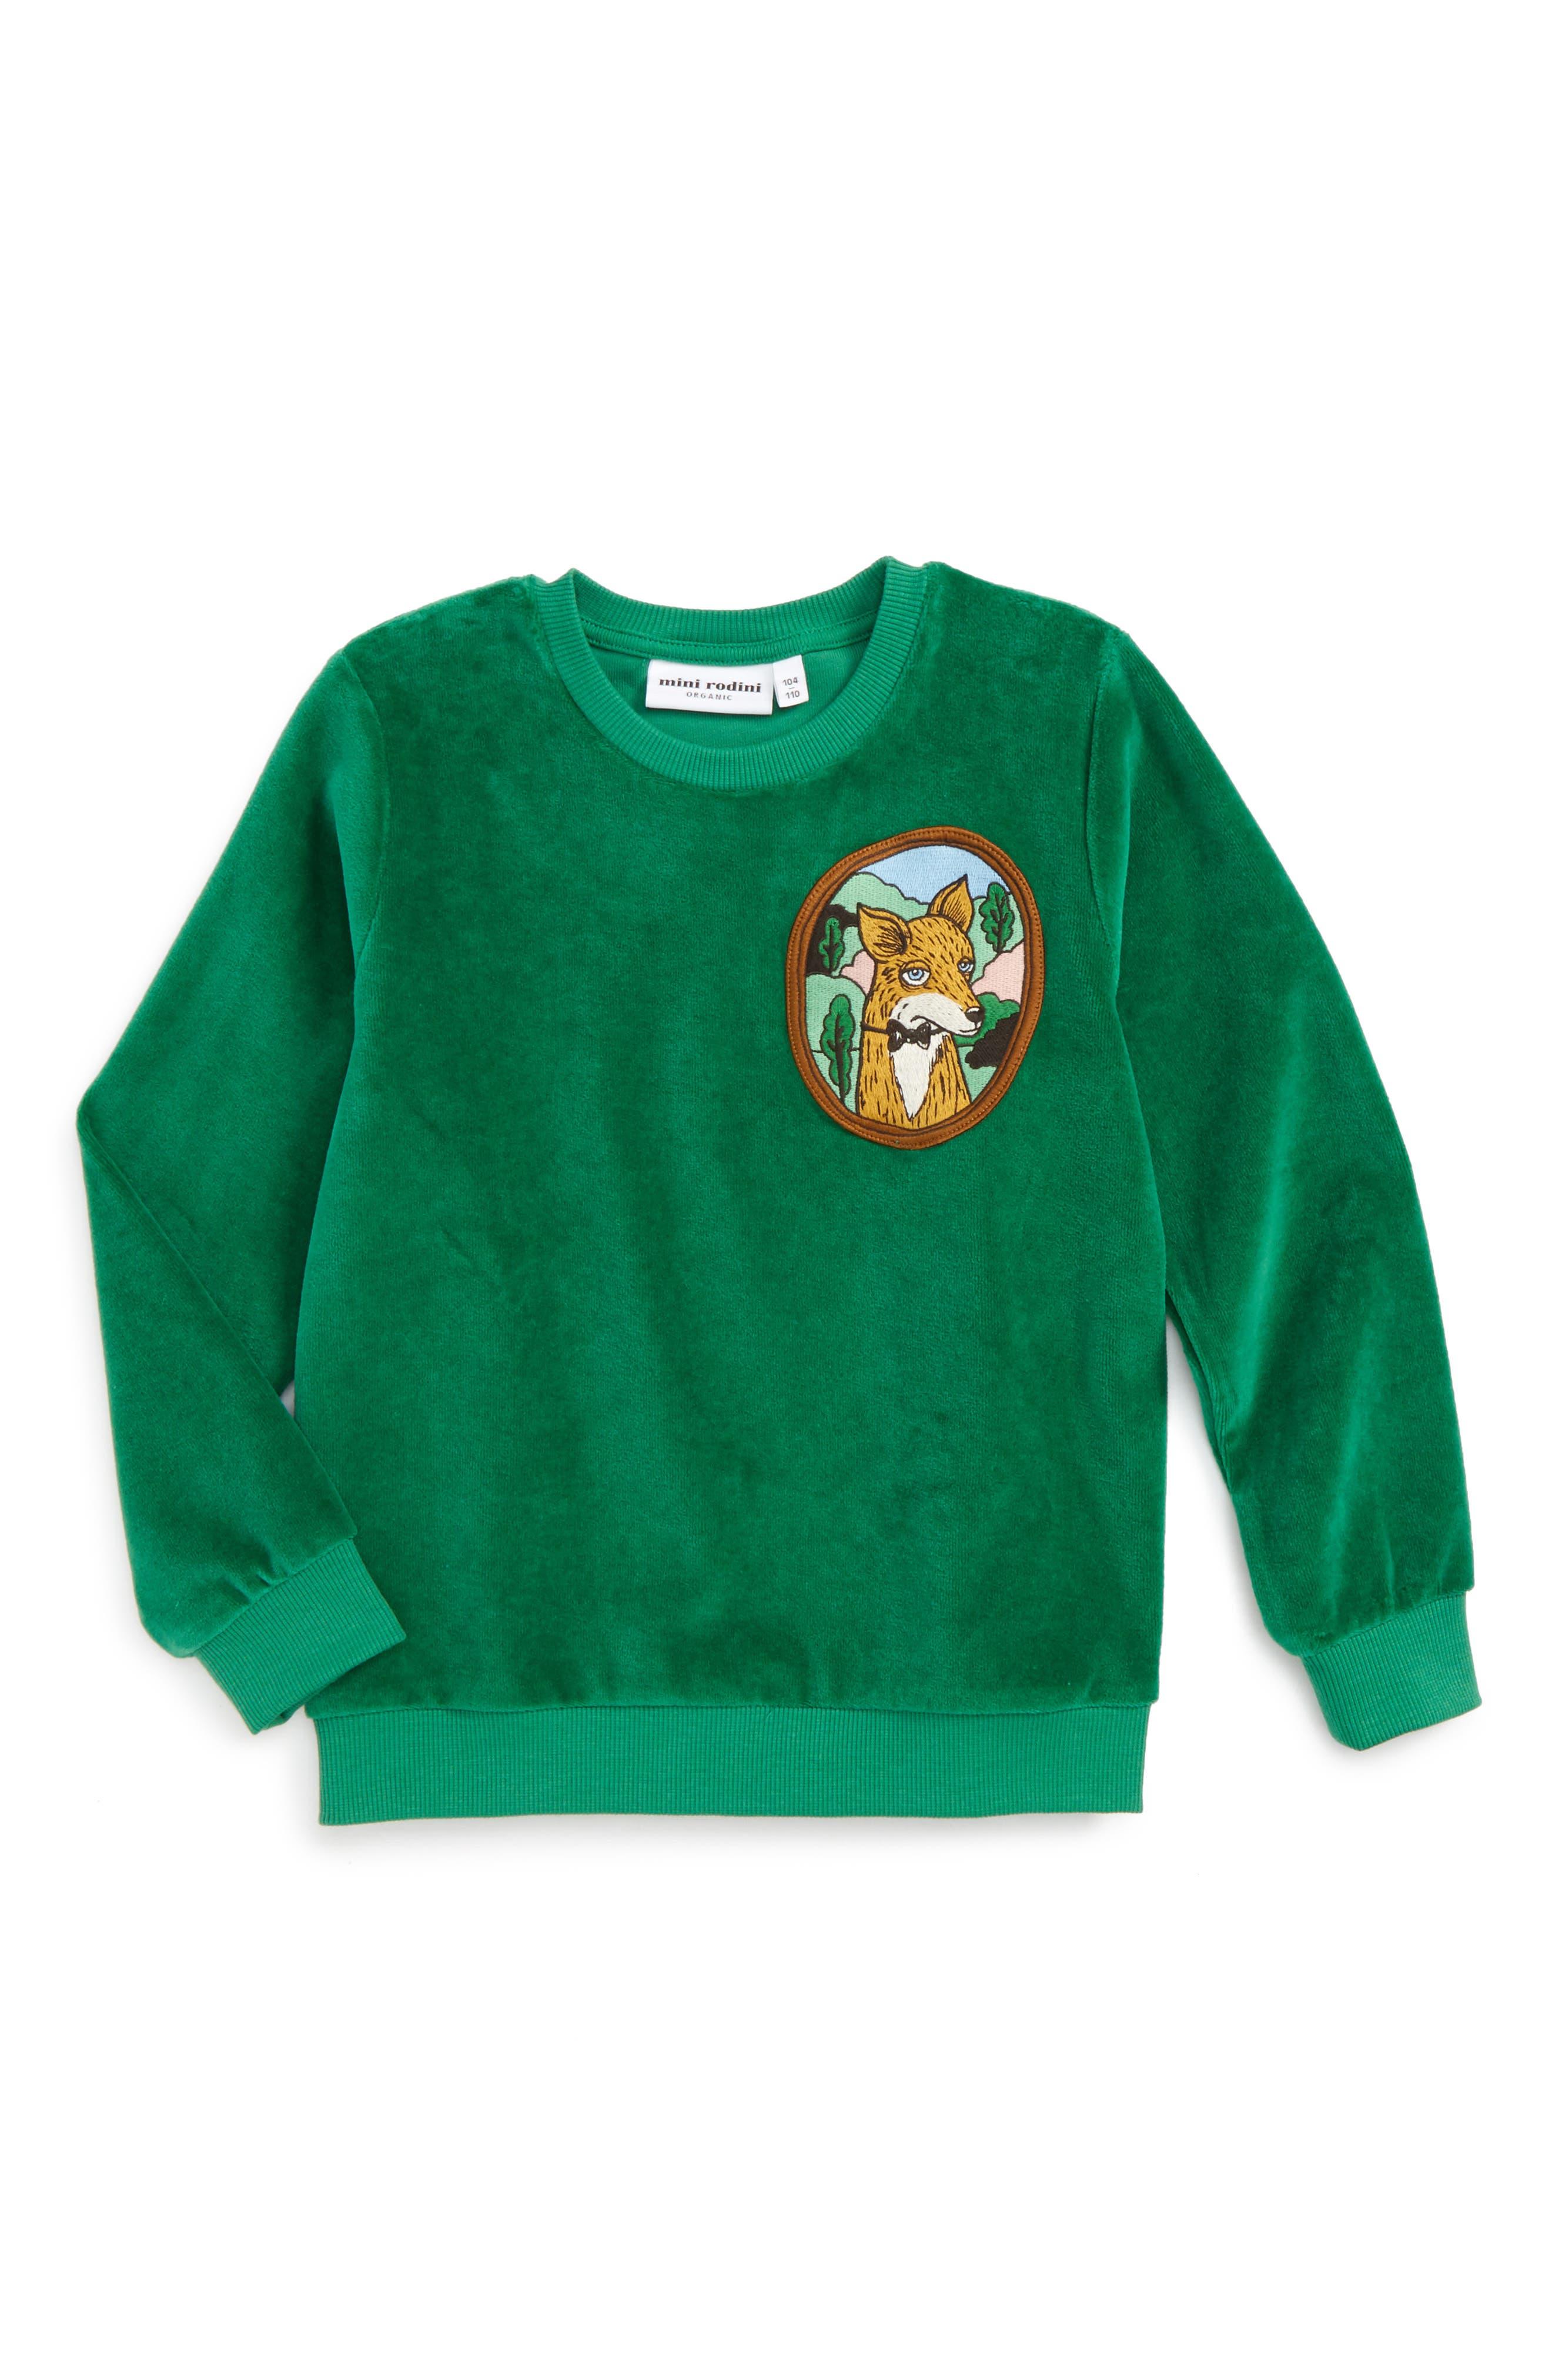 Alternate Image 1 Selected - Mini Rodini Fox Patch Velour Sweatshirt (Toddler Boys & Little Boys)